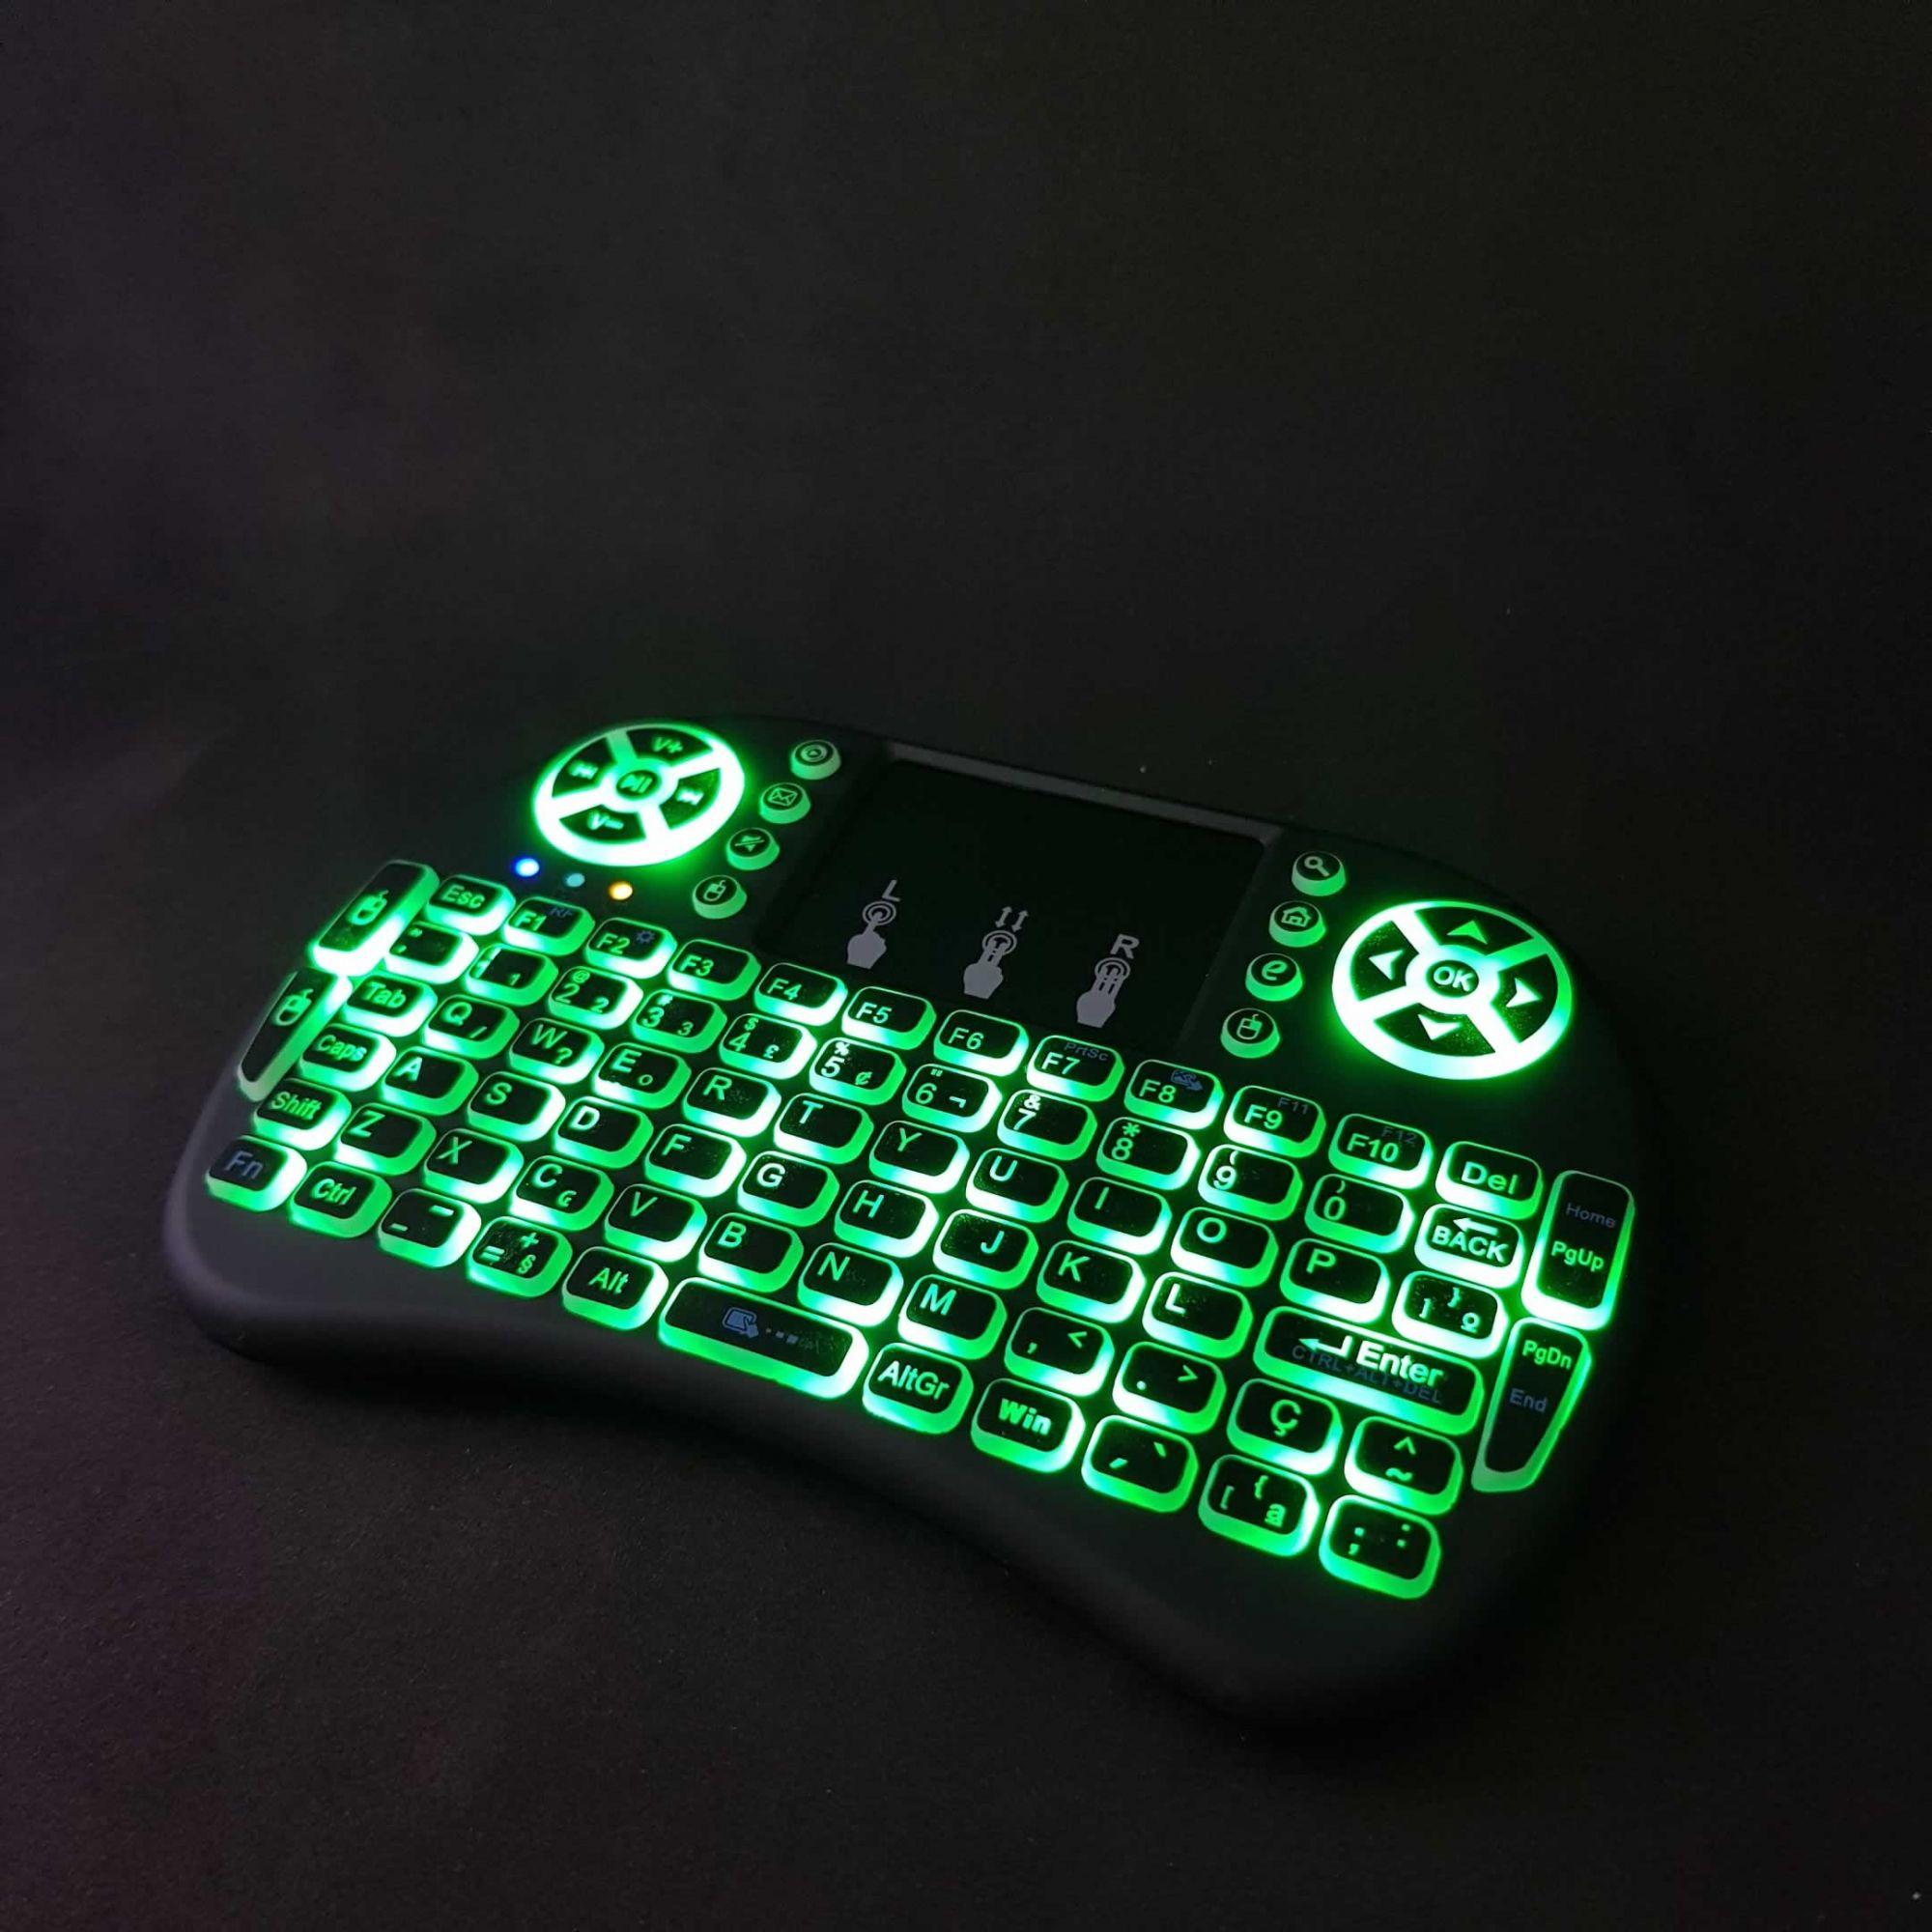 Mini Teclado Air Mouse Touch Sem Fio TVBox com LED Backlit KEY-7383